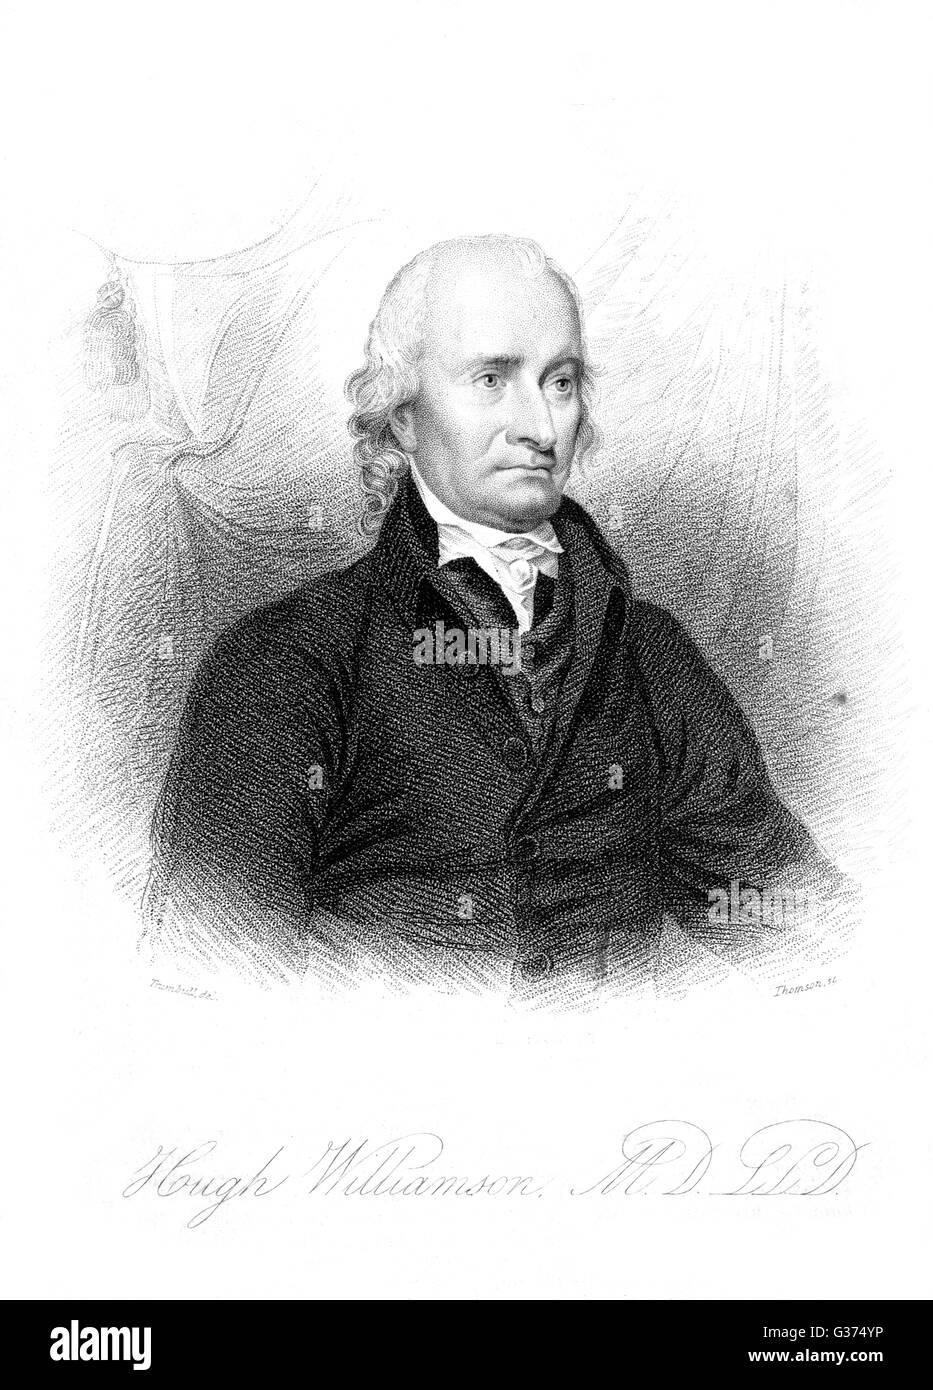 HUGH WILLIAMSON medical practitioner         Date: CIRCA 1823 - Stock Image